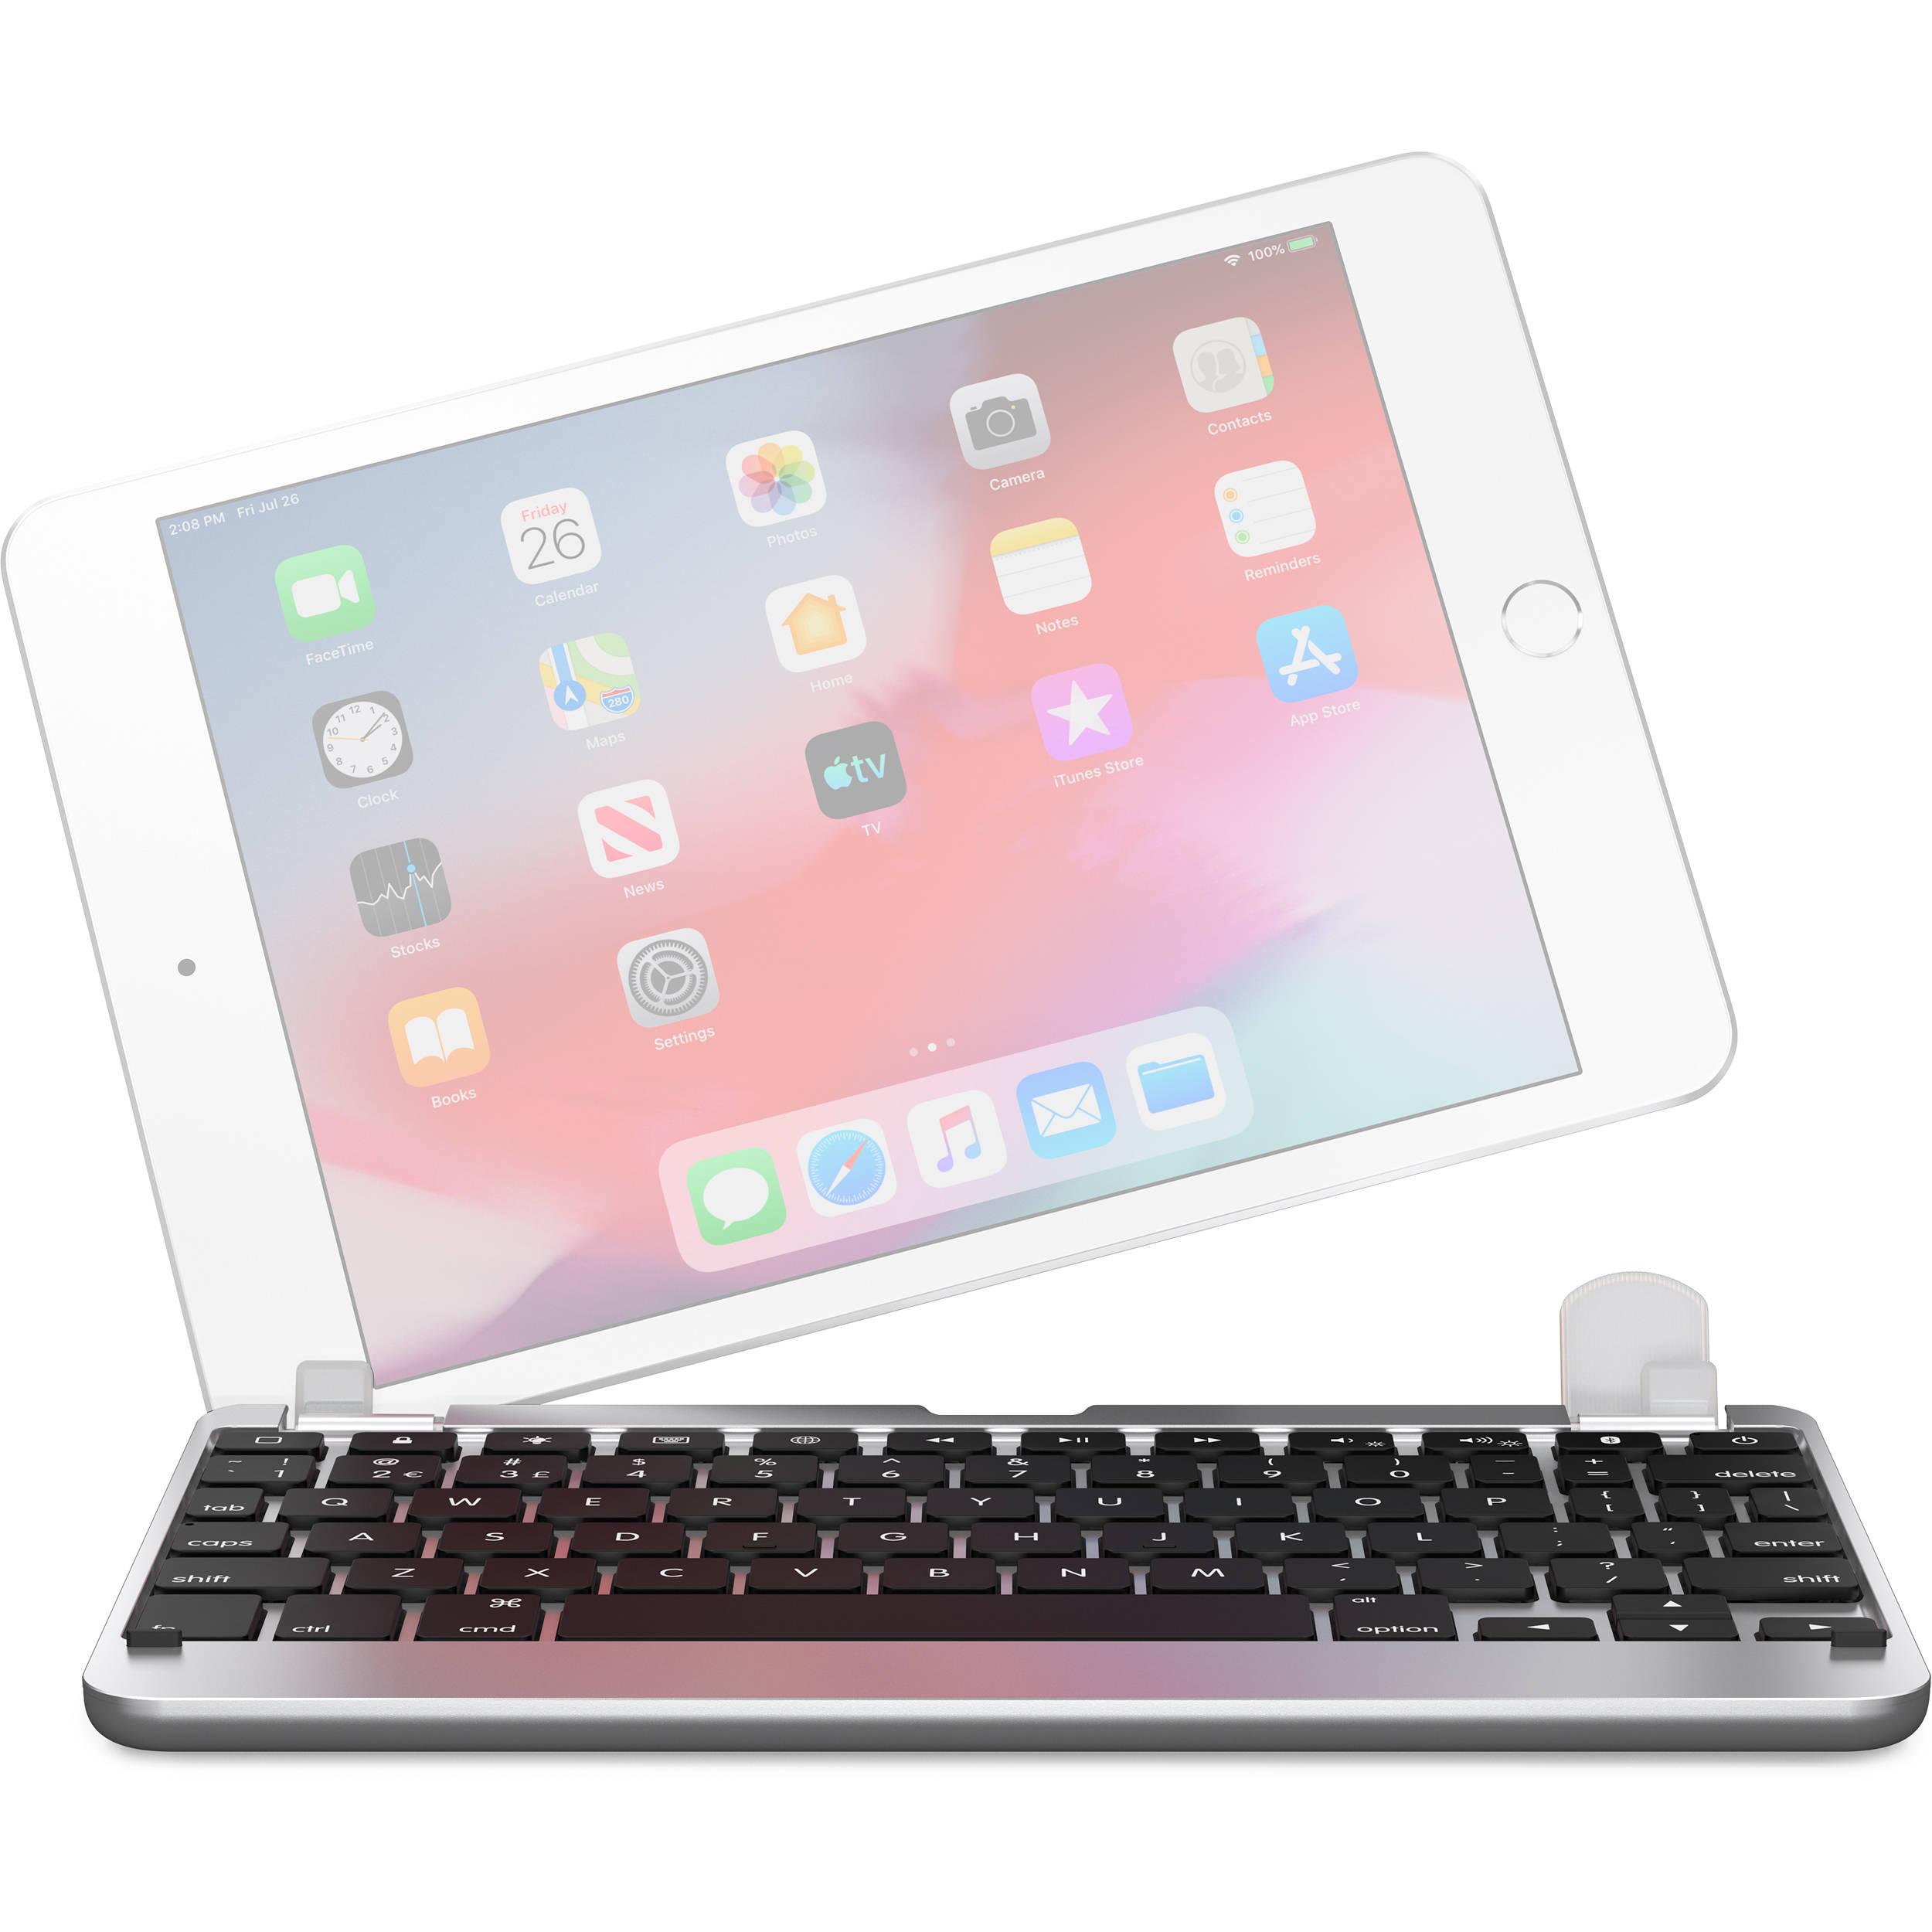 Brydge 7 9 Series 2 Wireless Backlit Keyboard For Ipad Bry5201